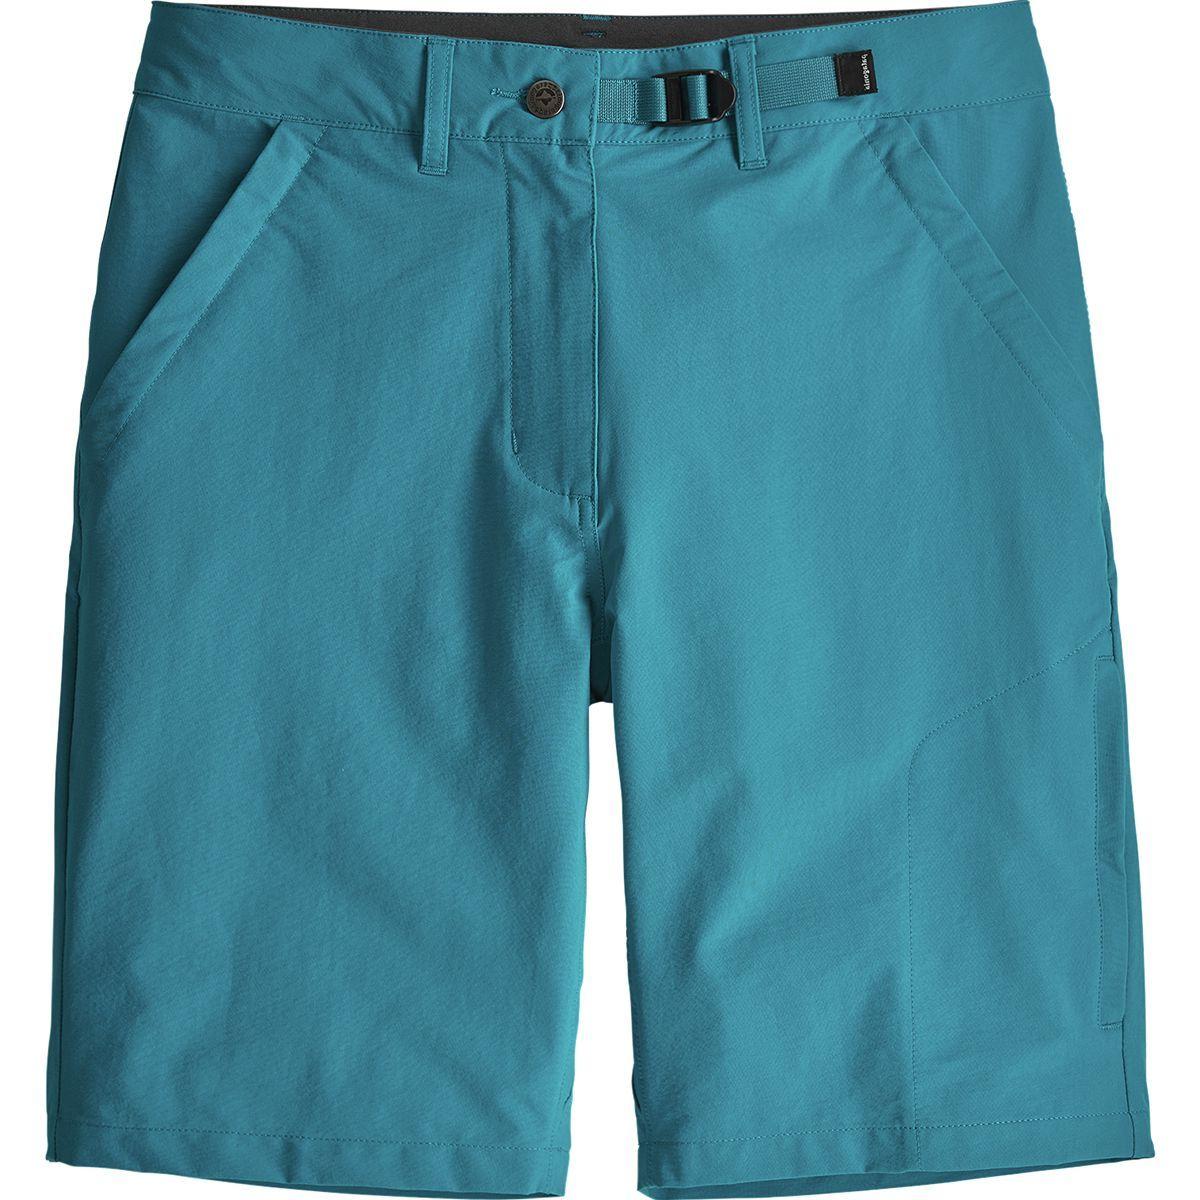 Patagonia Stonycroft 10in Short - Men's